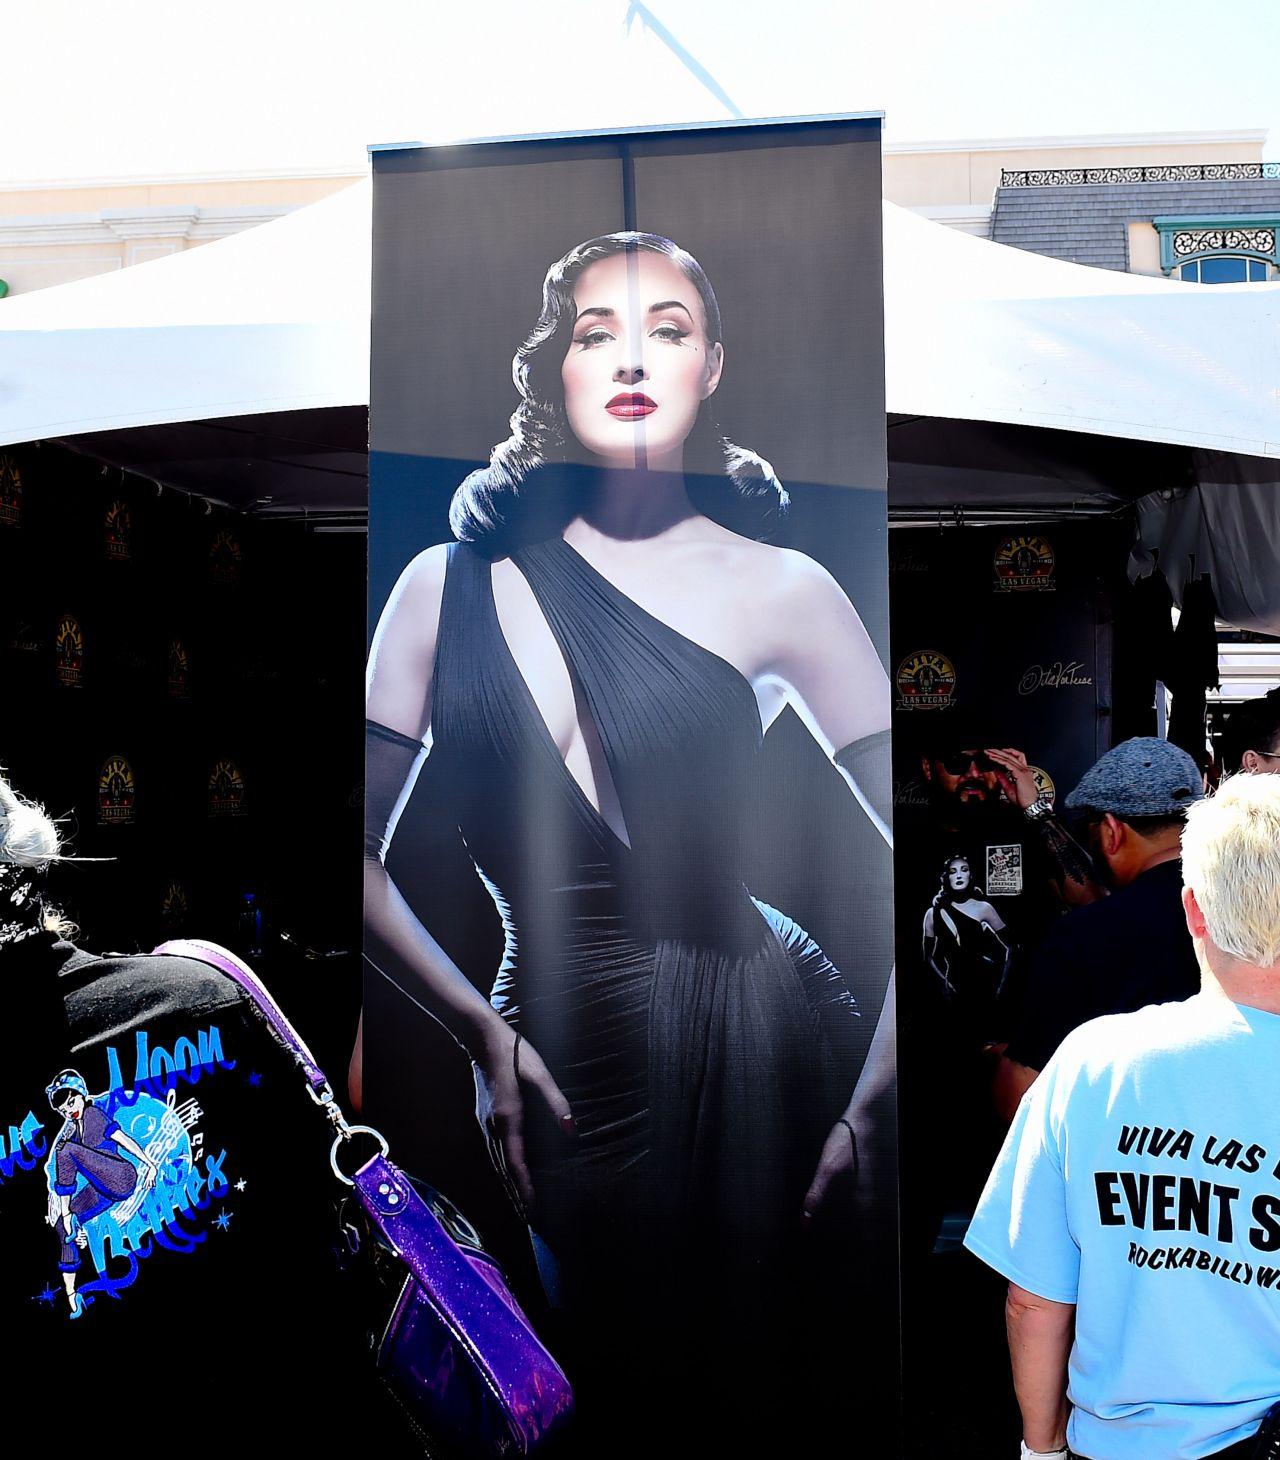 Viva Las Vegas Rockabilly Car Show 2017